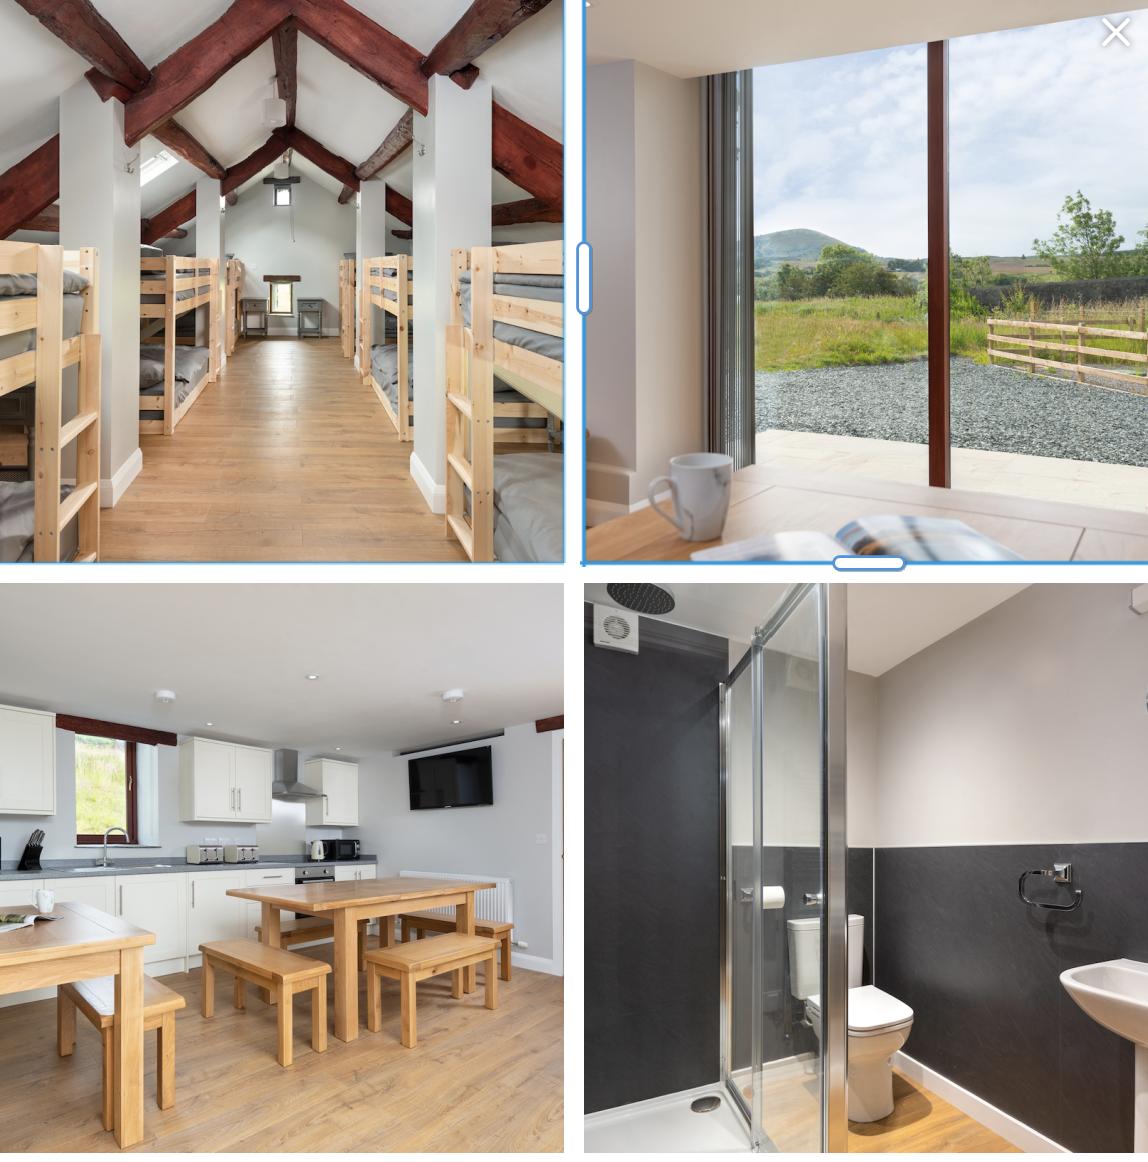 camping barn sleeps 14 with WiFi near Ullswater